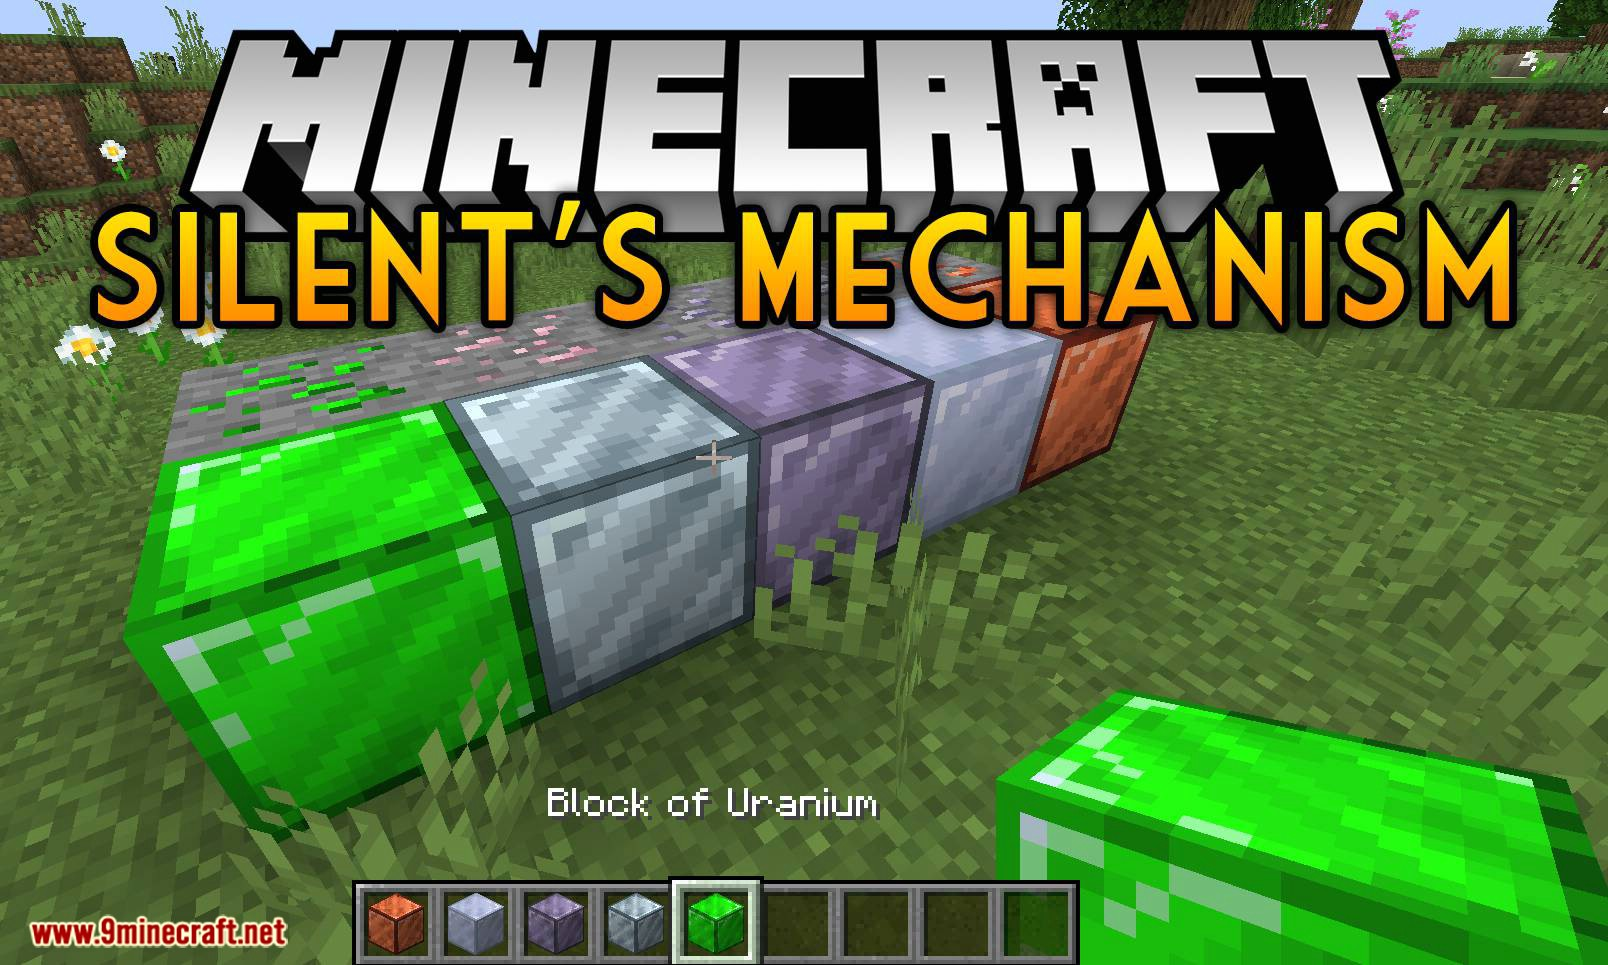 Silent_s Mechanism mod for minecraft logo